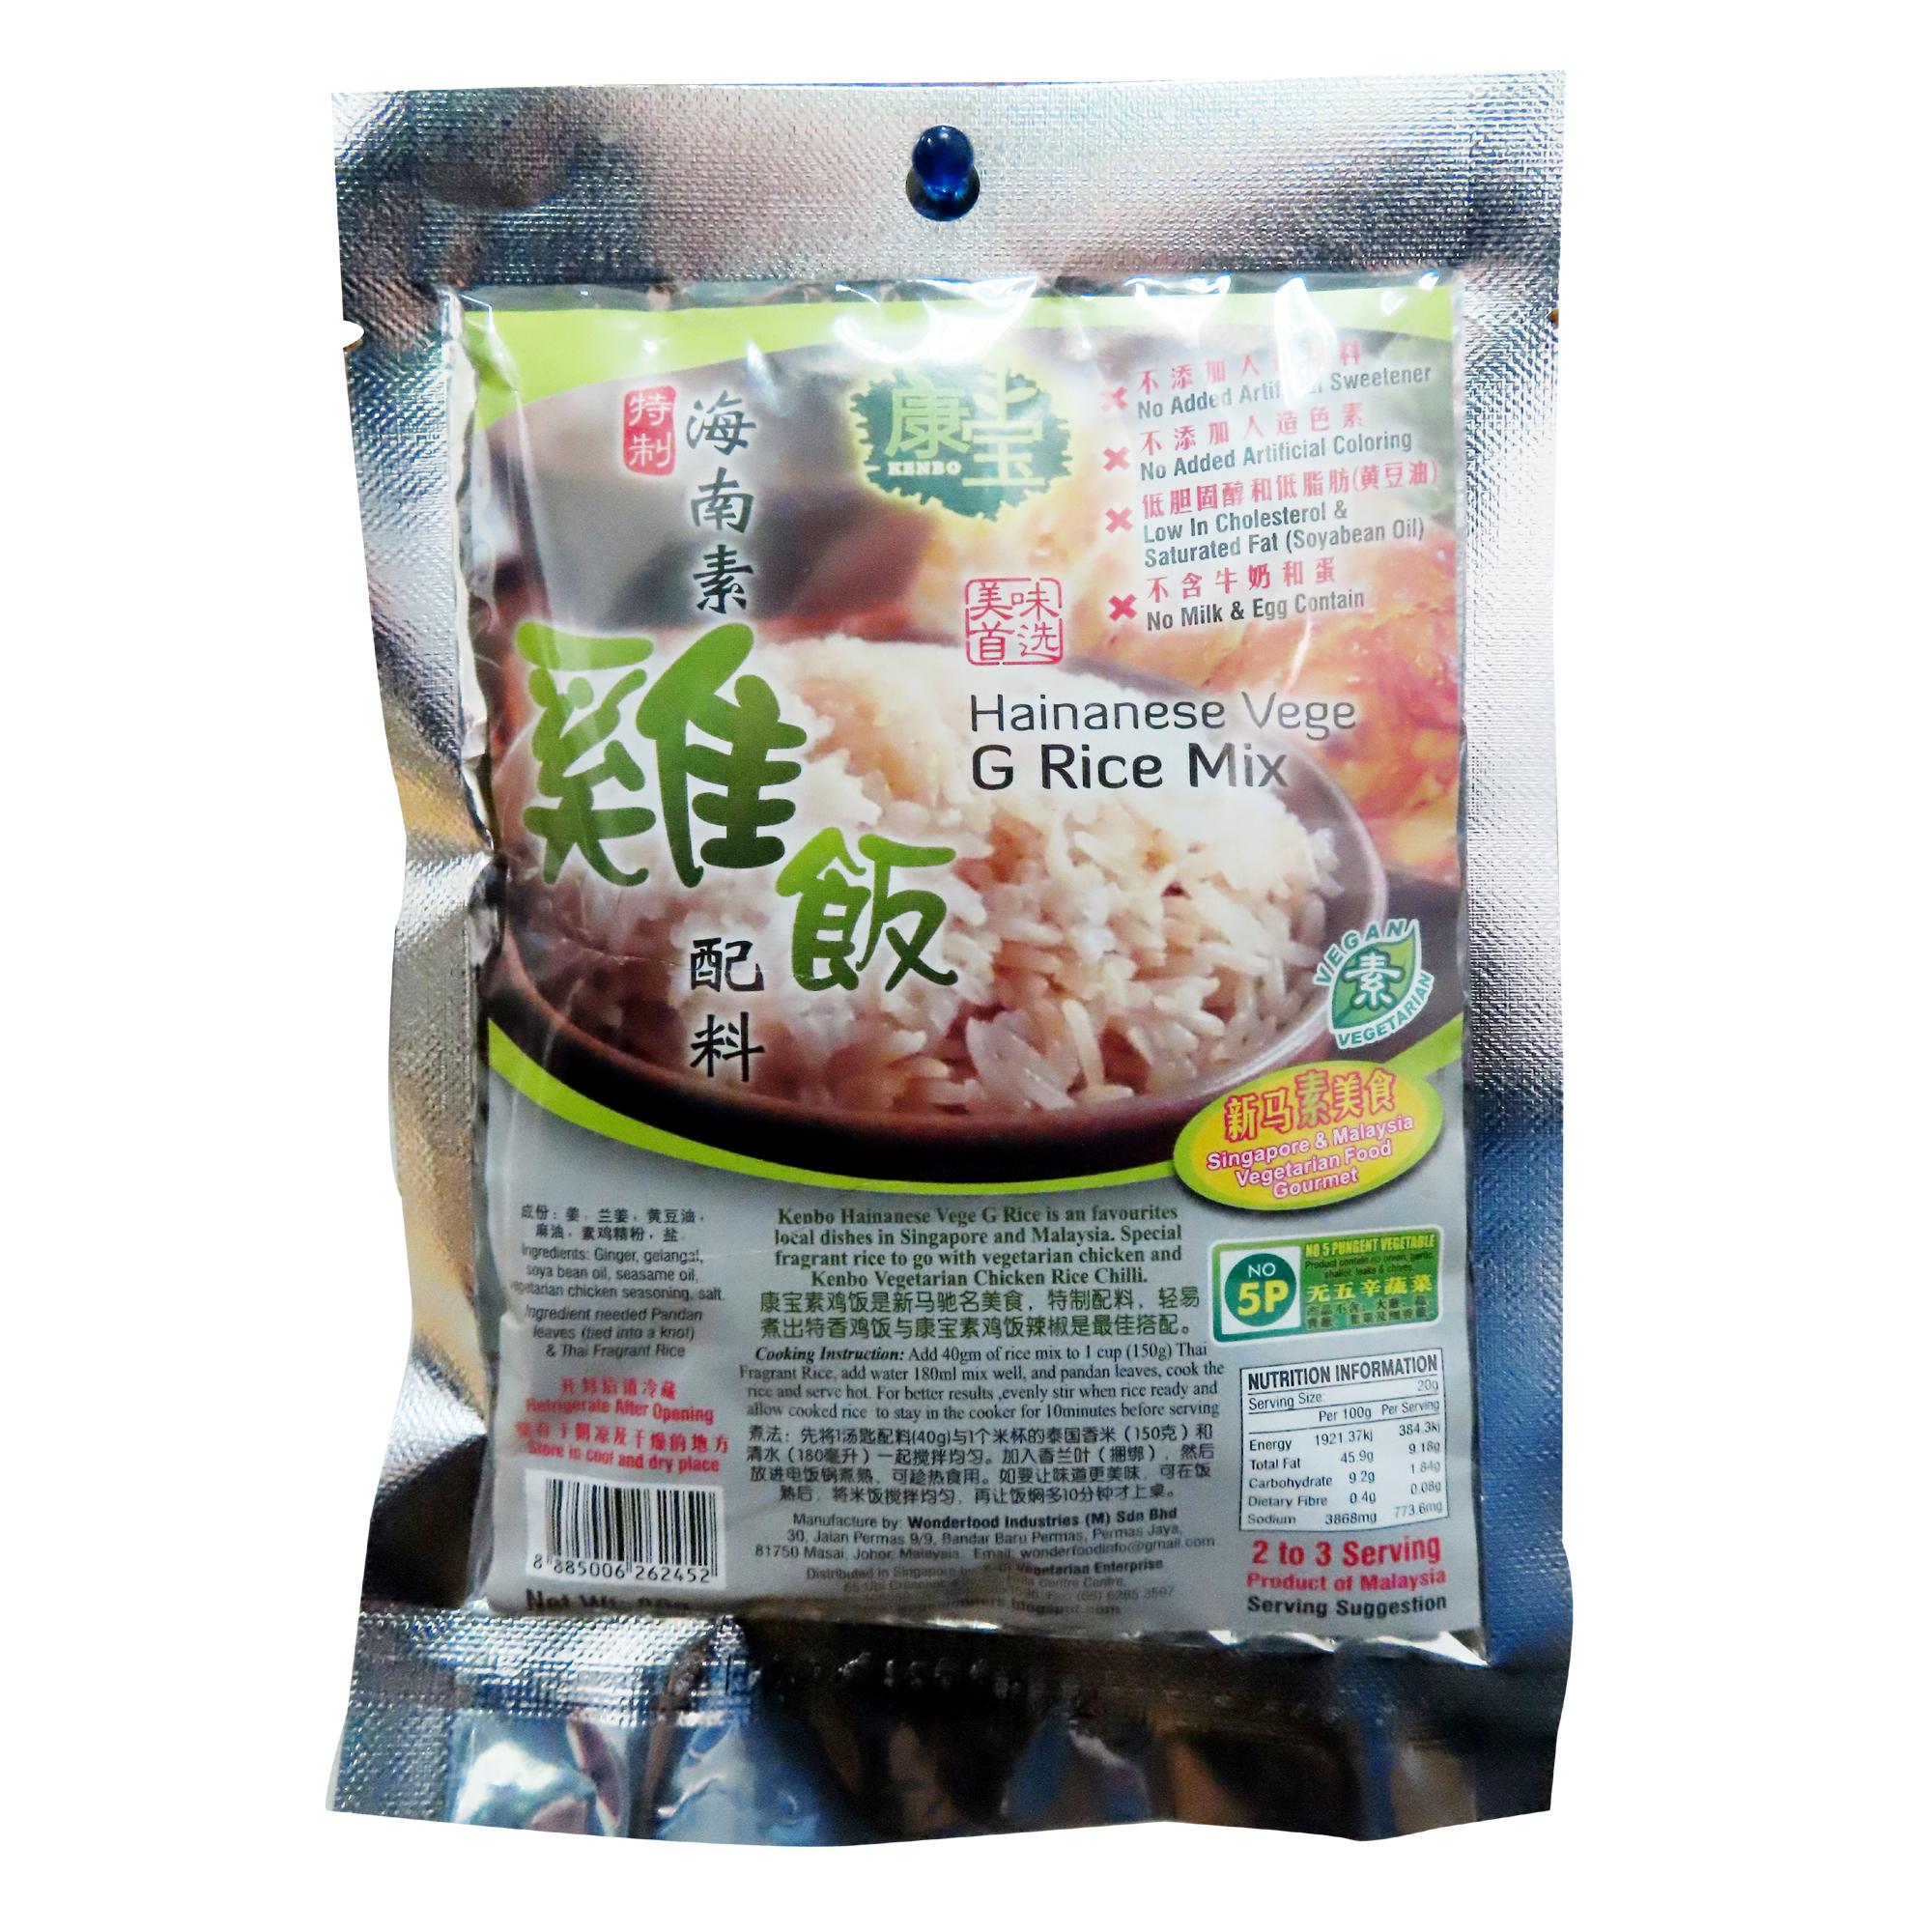 Image Kenbo Hainanese vege G rice Mix 康宝-海南素鸡饭配料 80grams